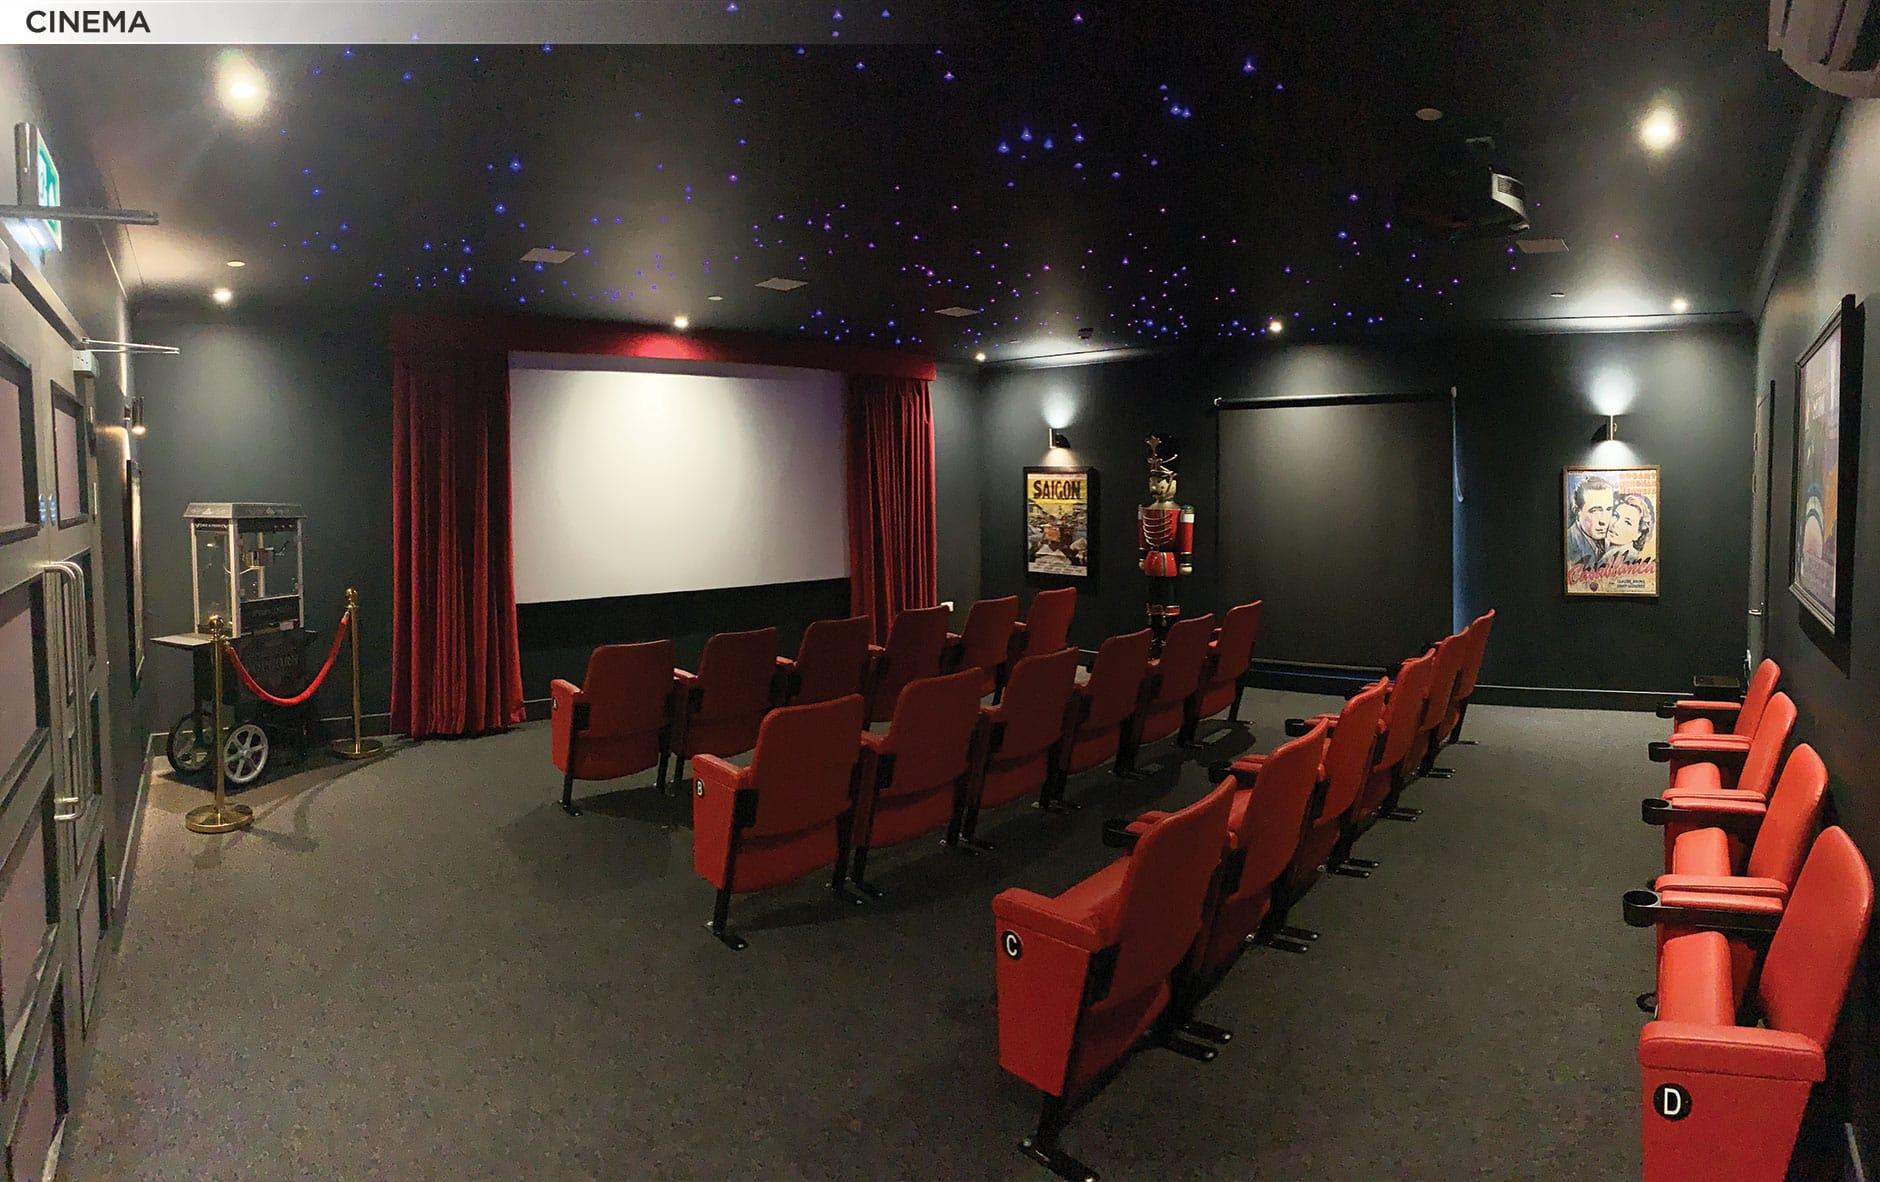 NS-cinema